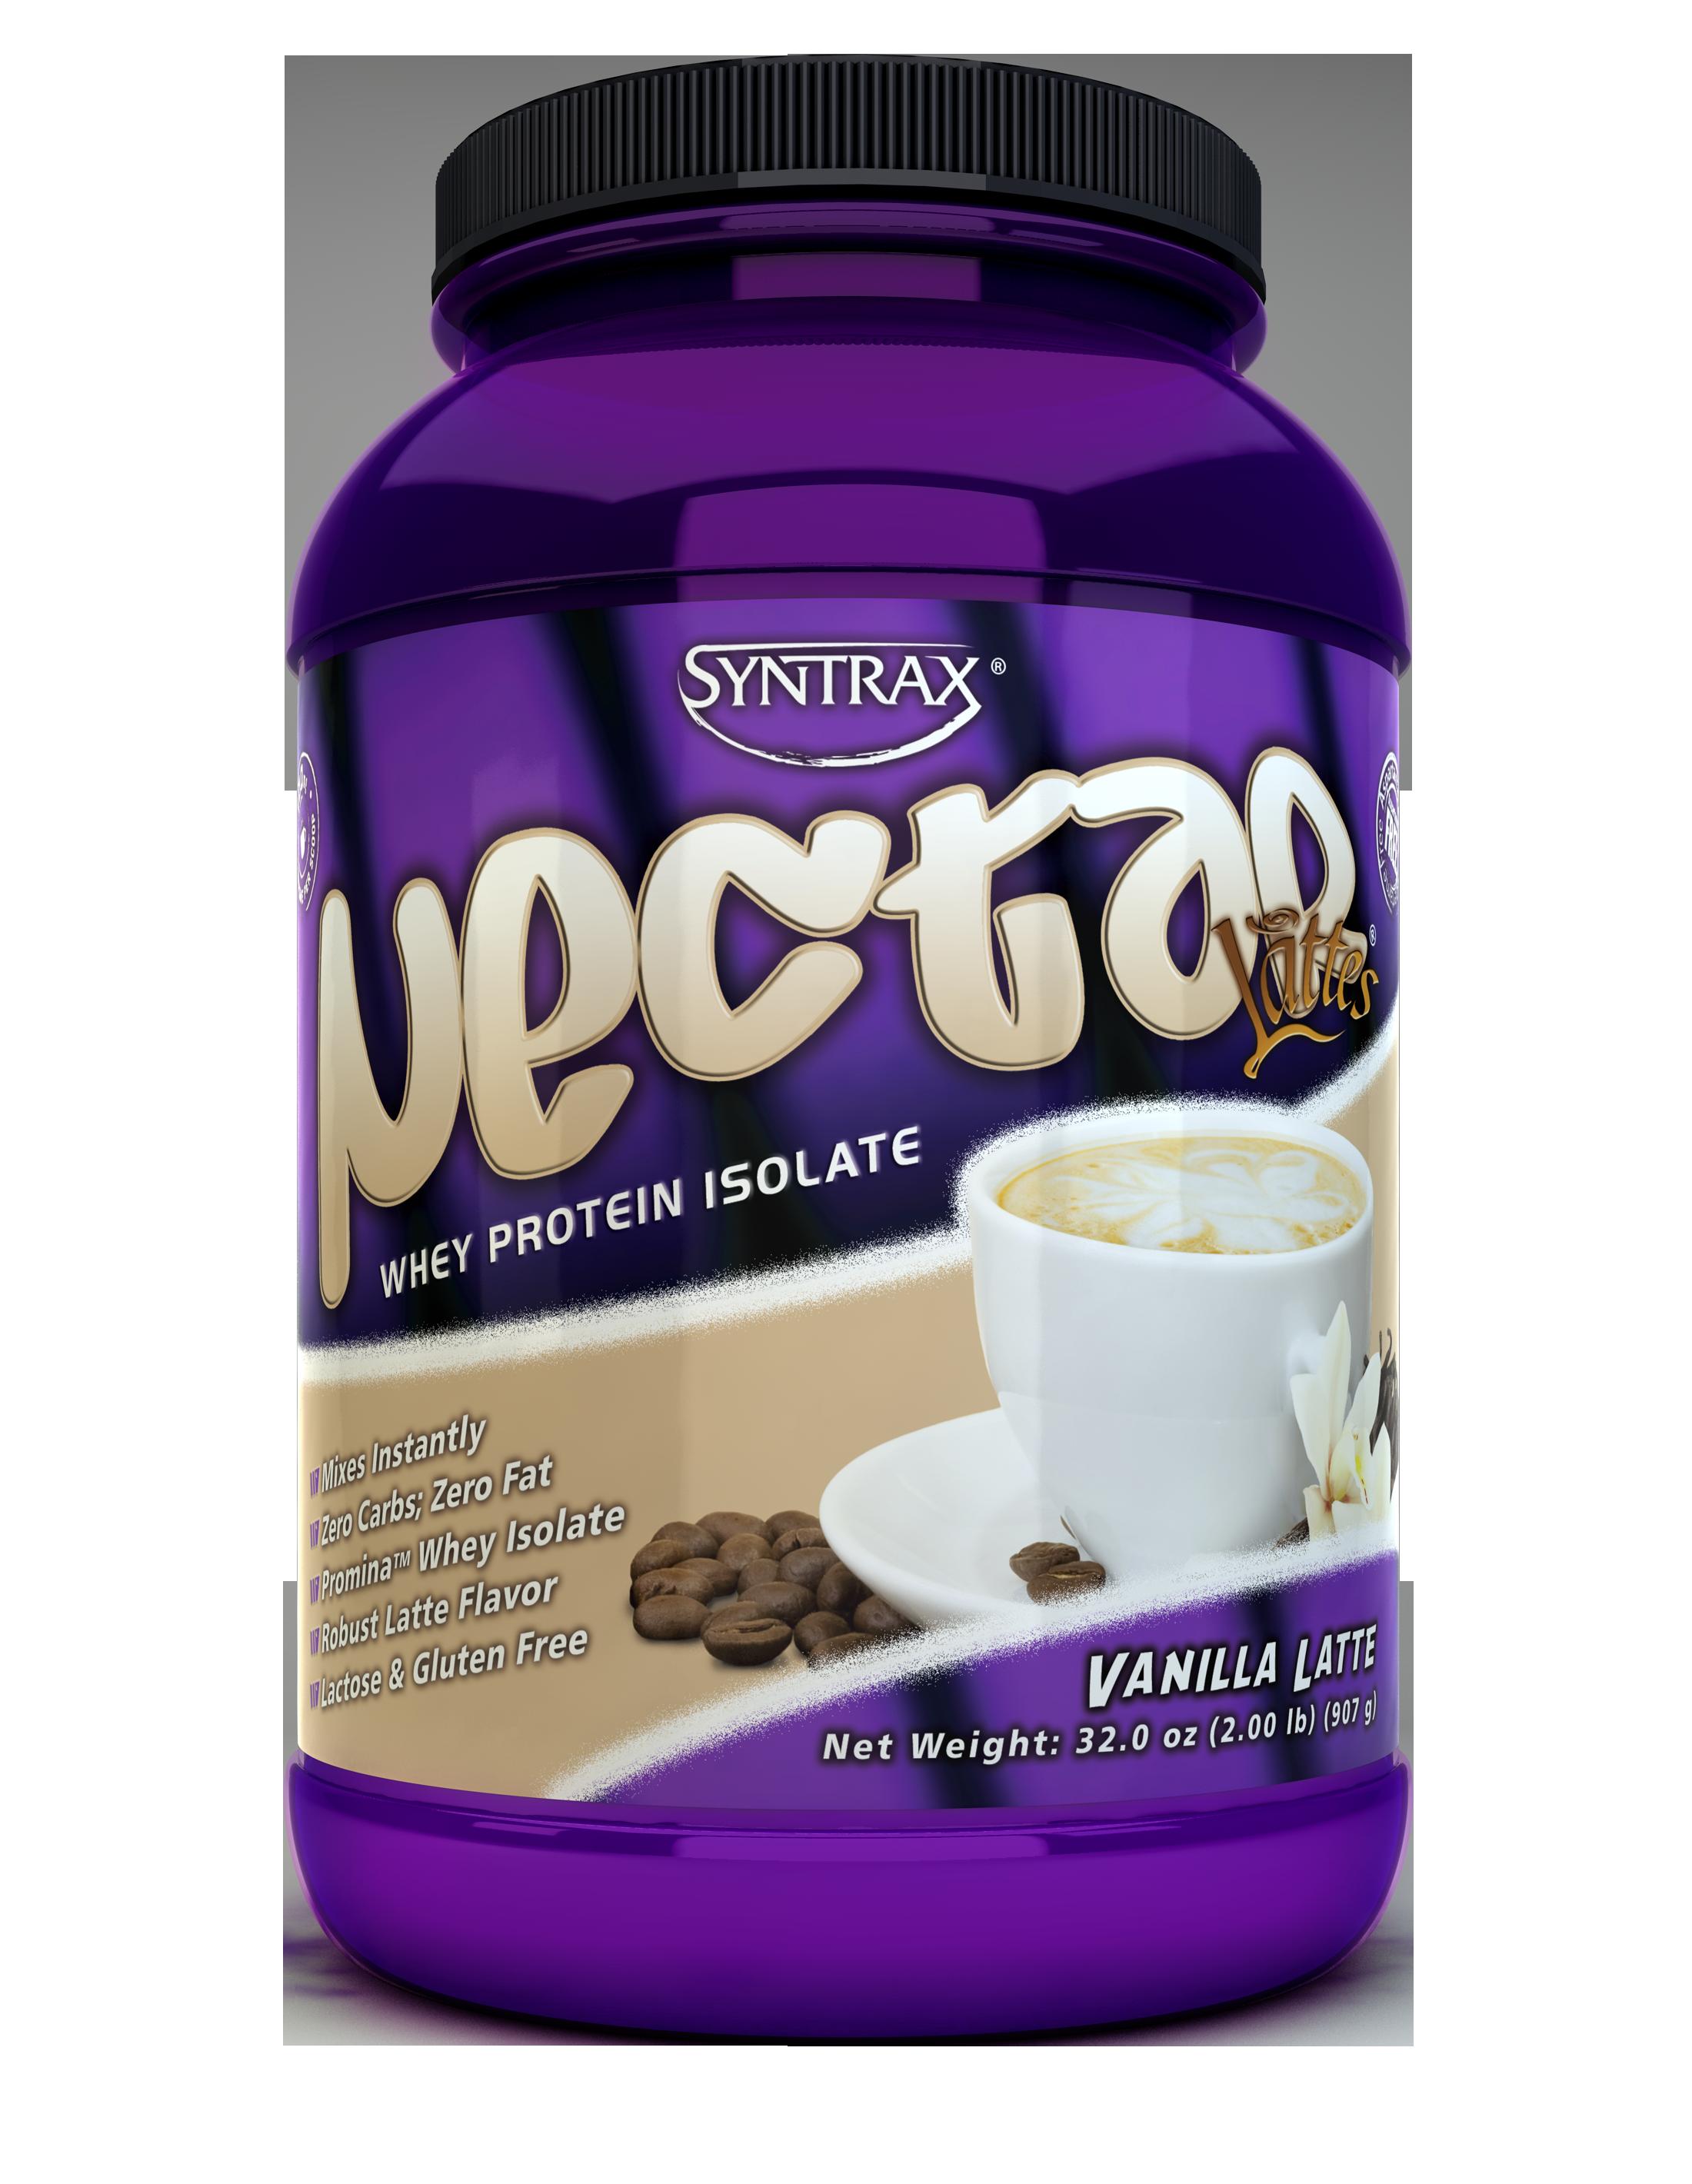 Syntrax Nectar Lattes - Vanilla Latte 2 lb